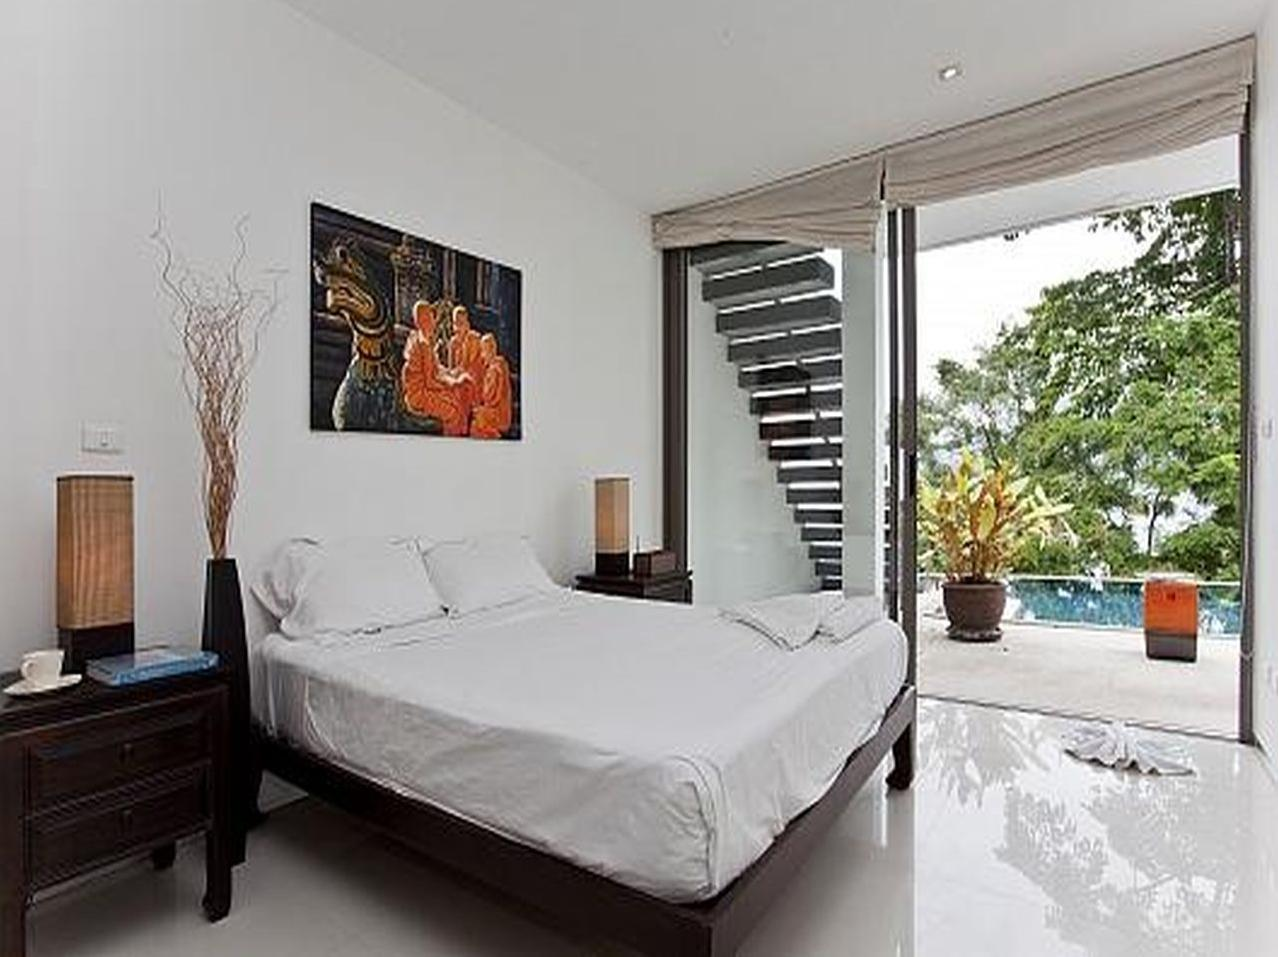 Atika Villas Phuket อติกา วิลลาส์ ภูเก็ต